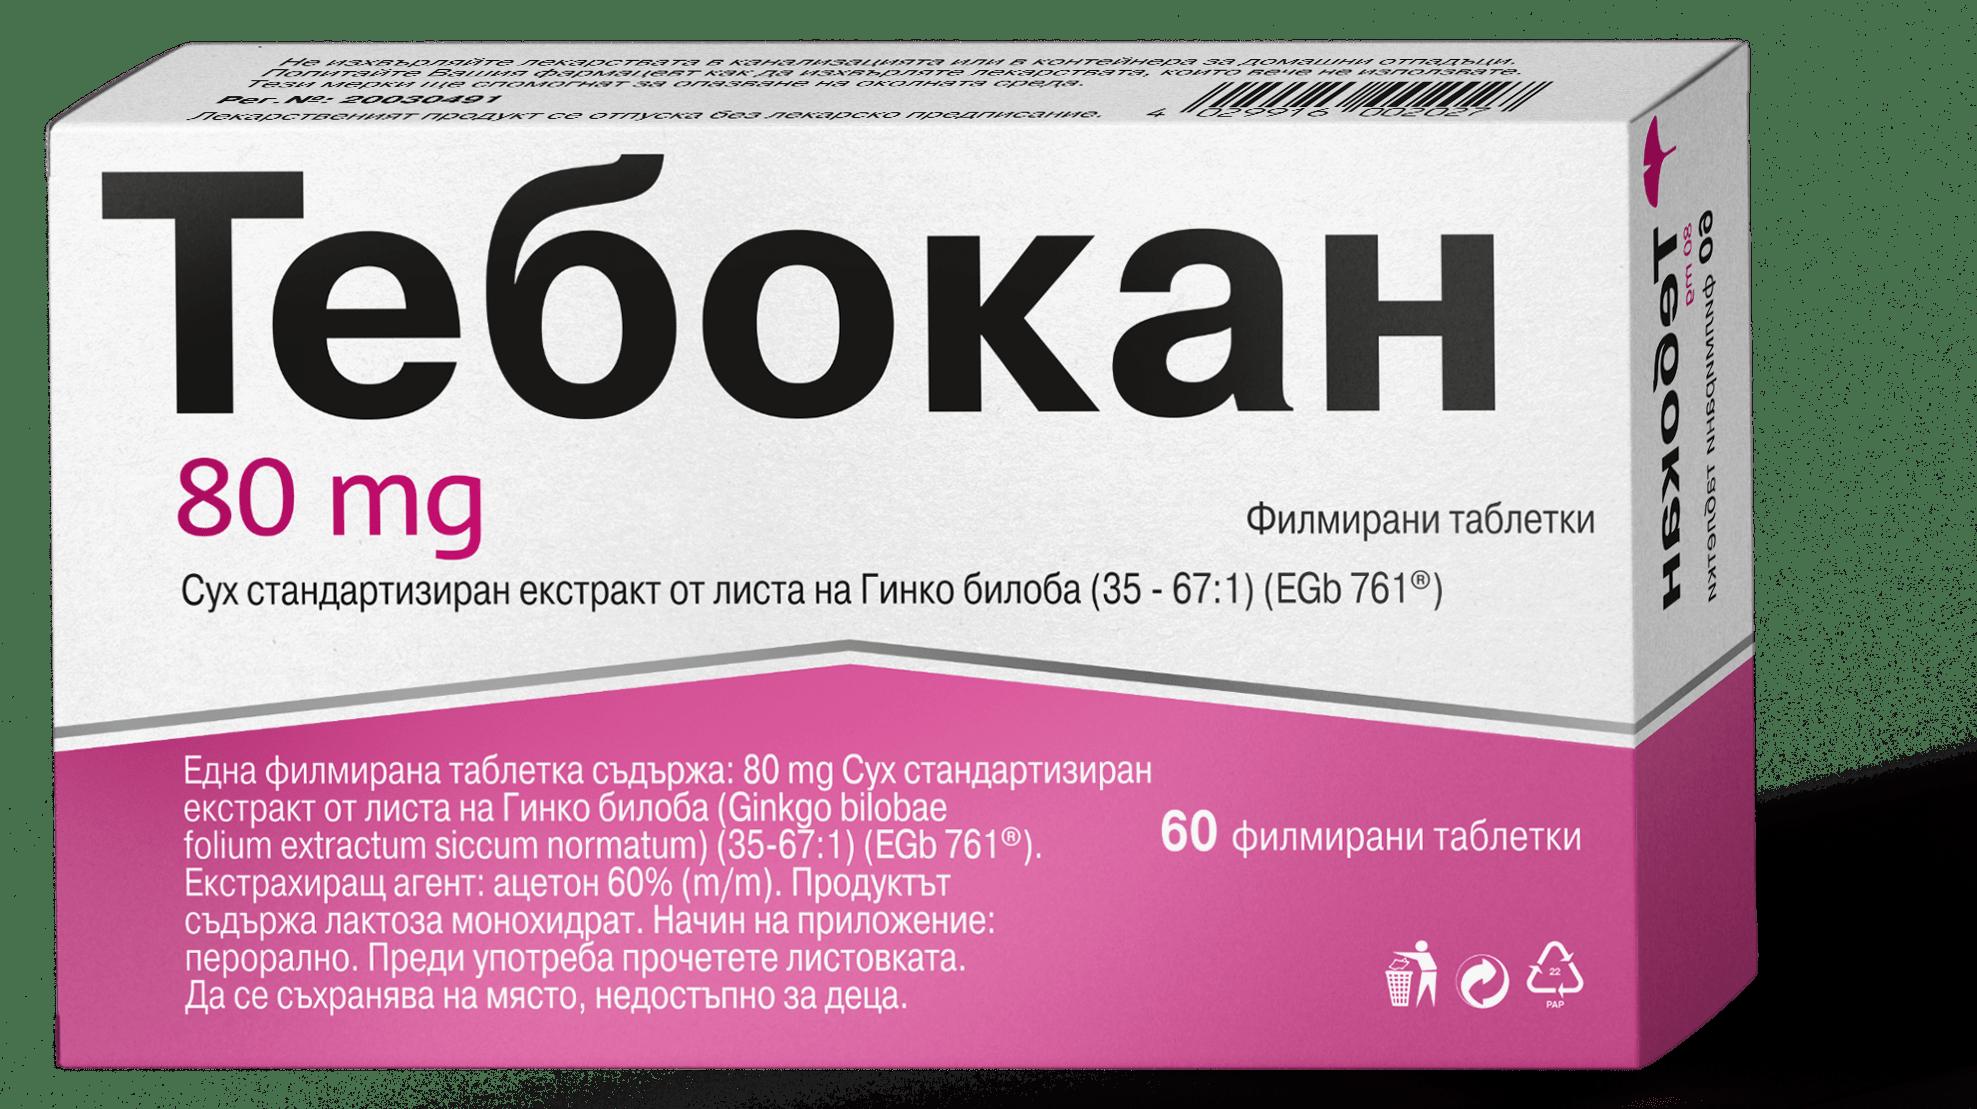 Тебокан 80 mg таблетки